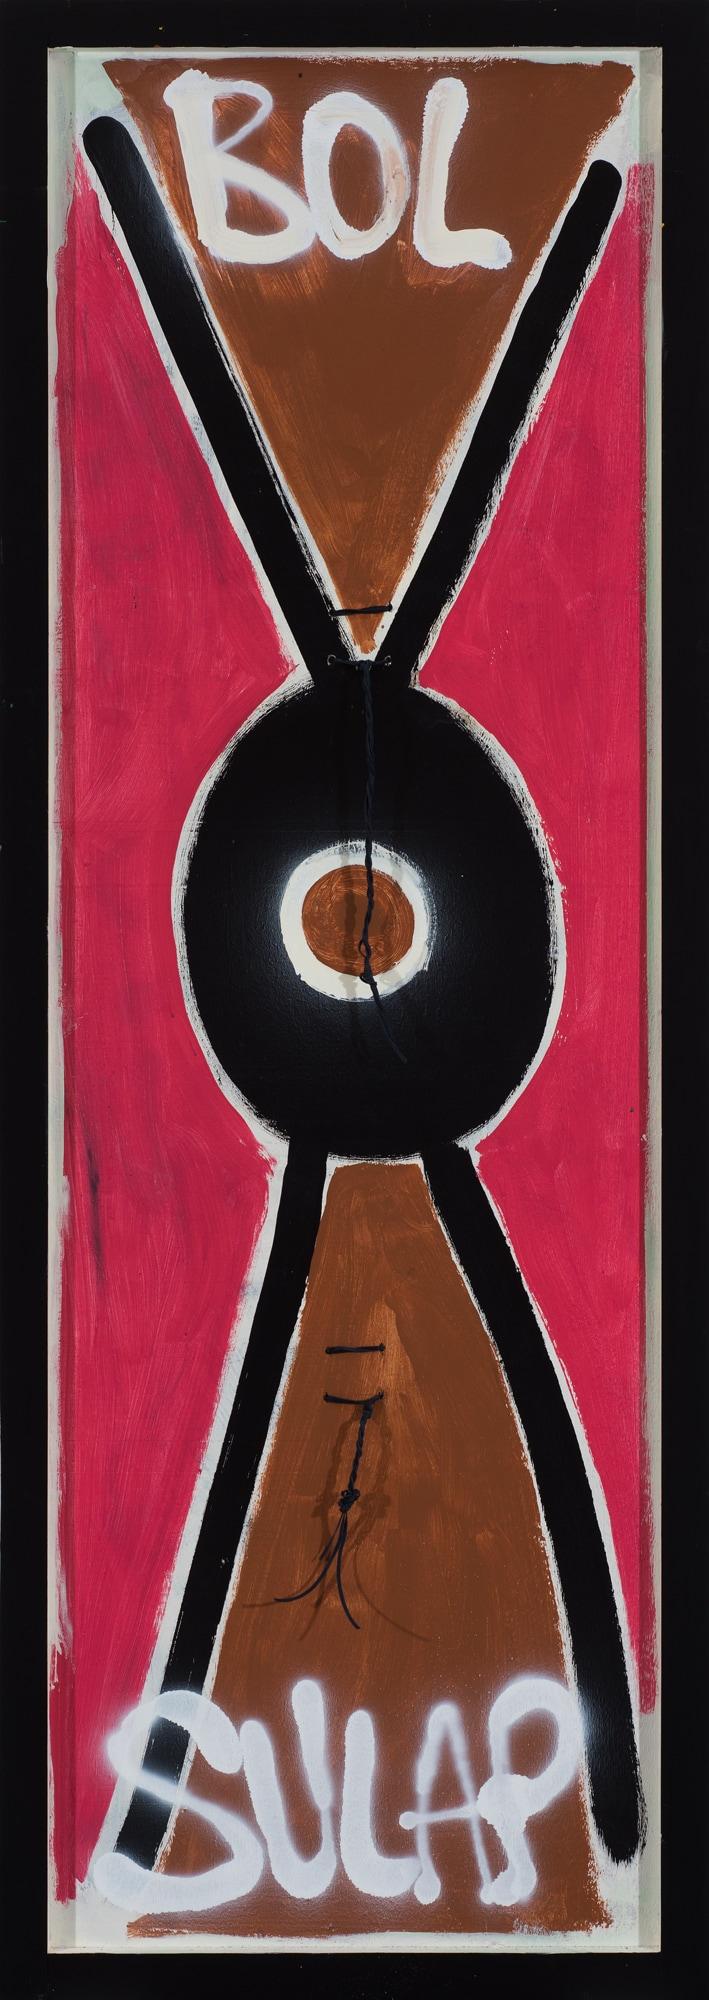 Eric Bridgman, Bol Sulap (verso), 170x60cm